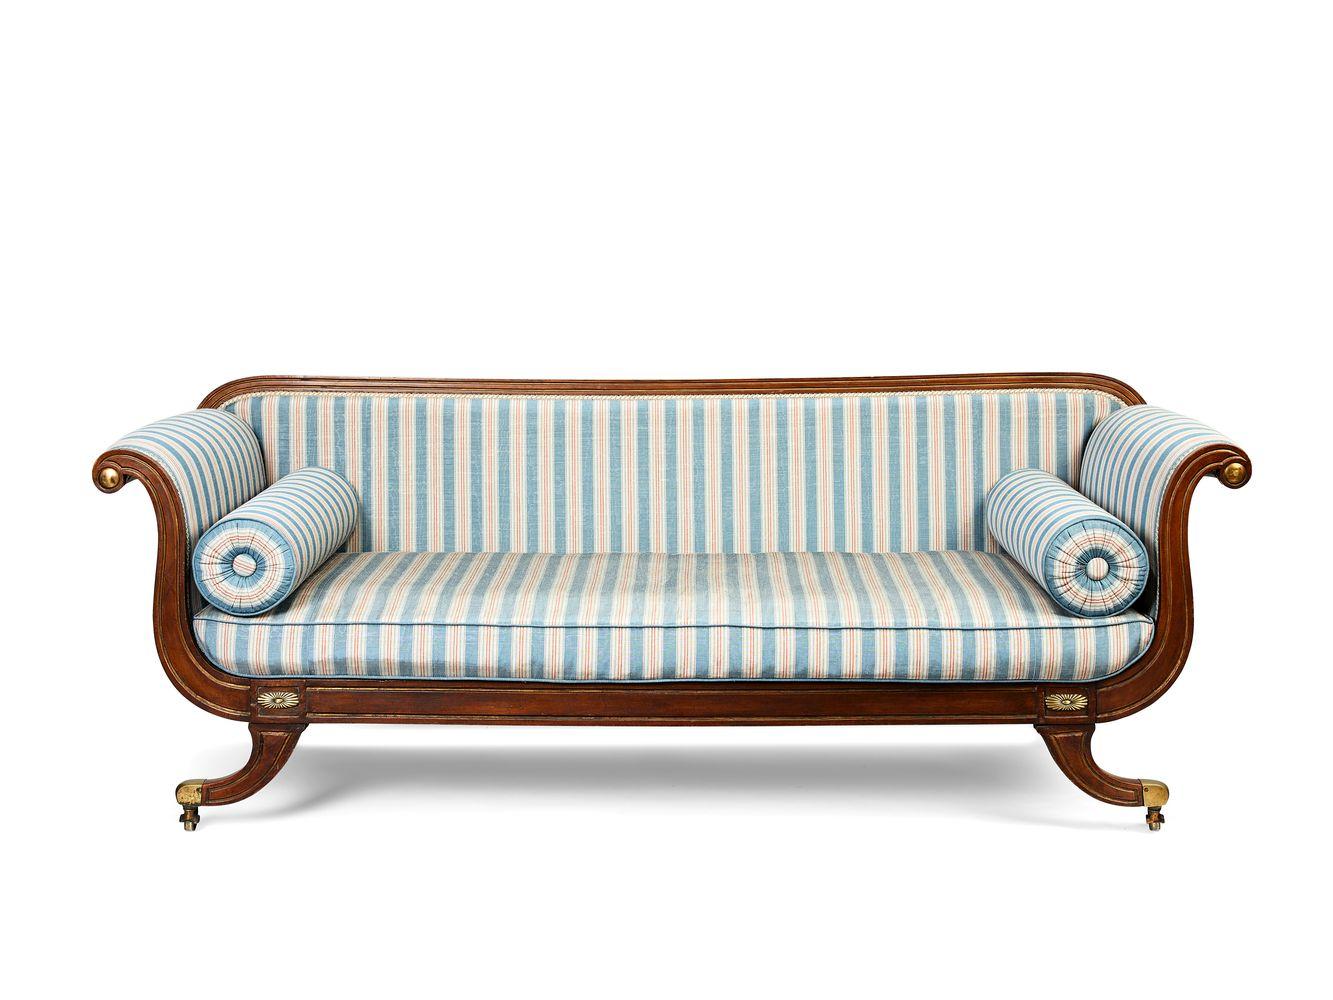 A Regency beechwood, parcel-gilt and brass-mounted scroll-end sofa, circa 1815